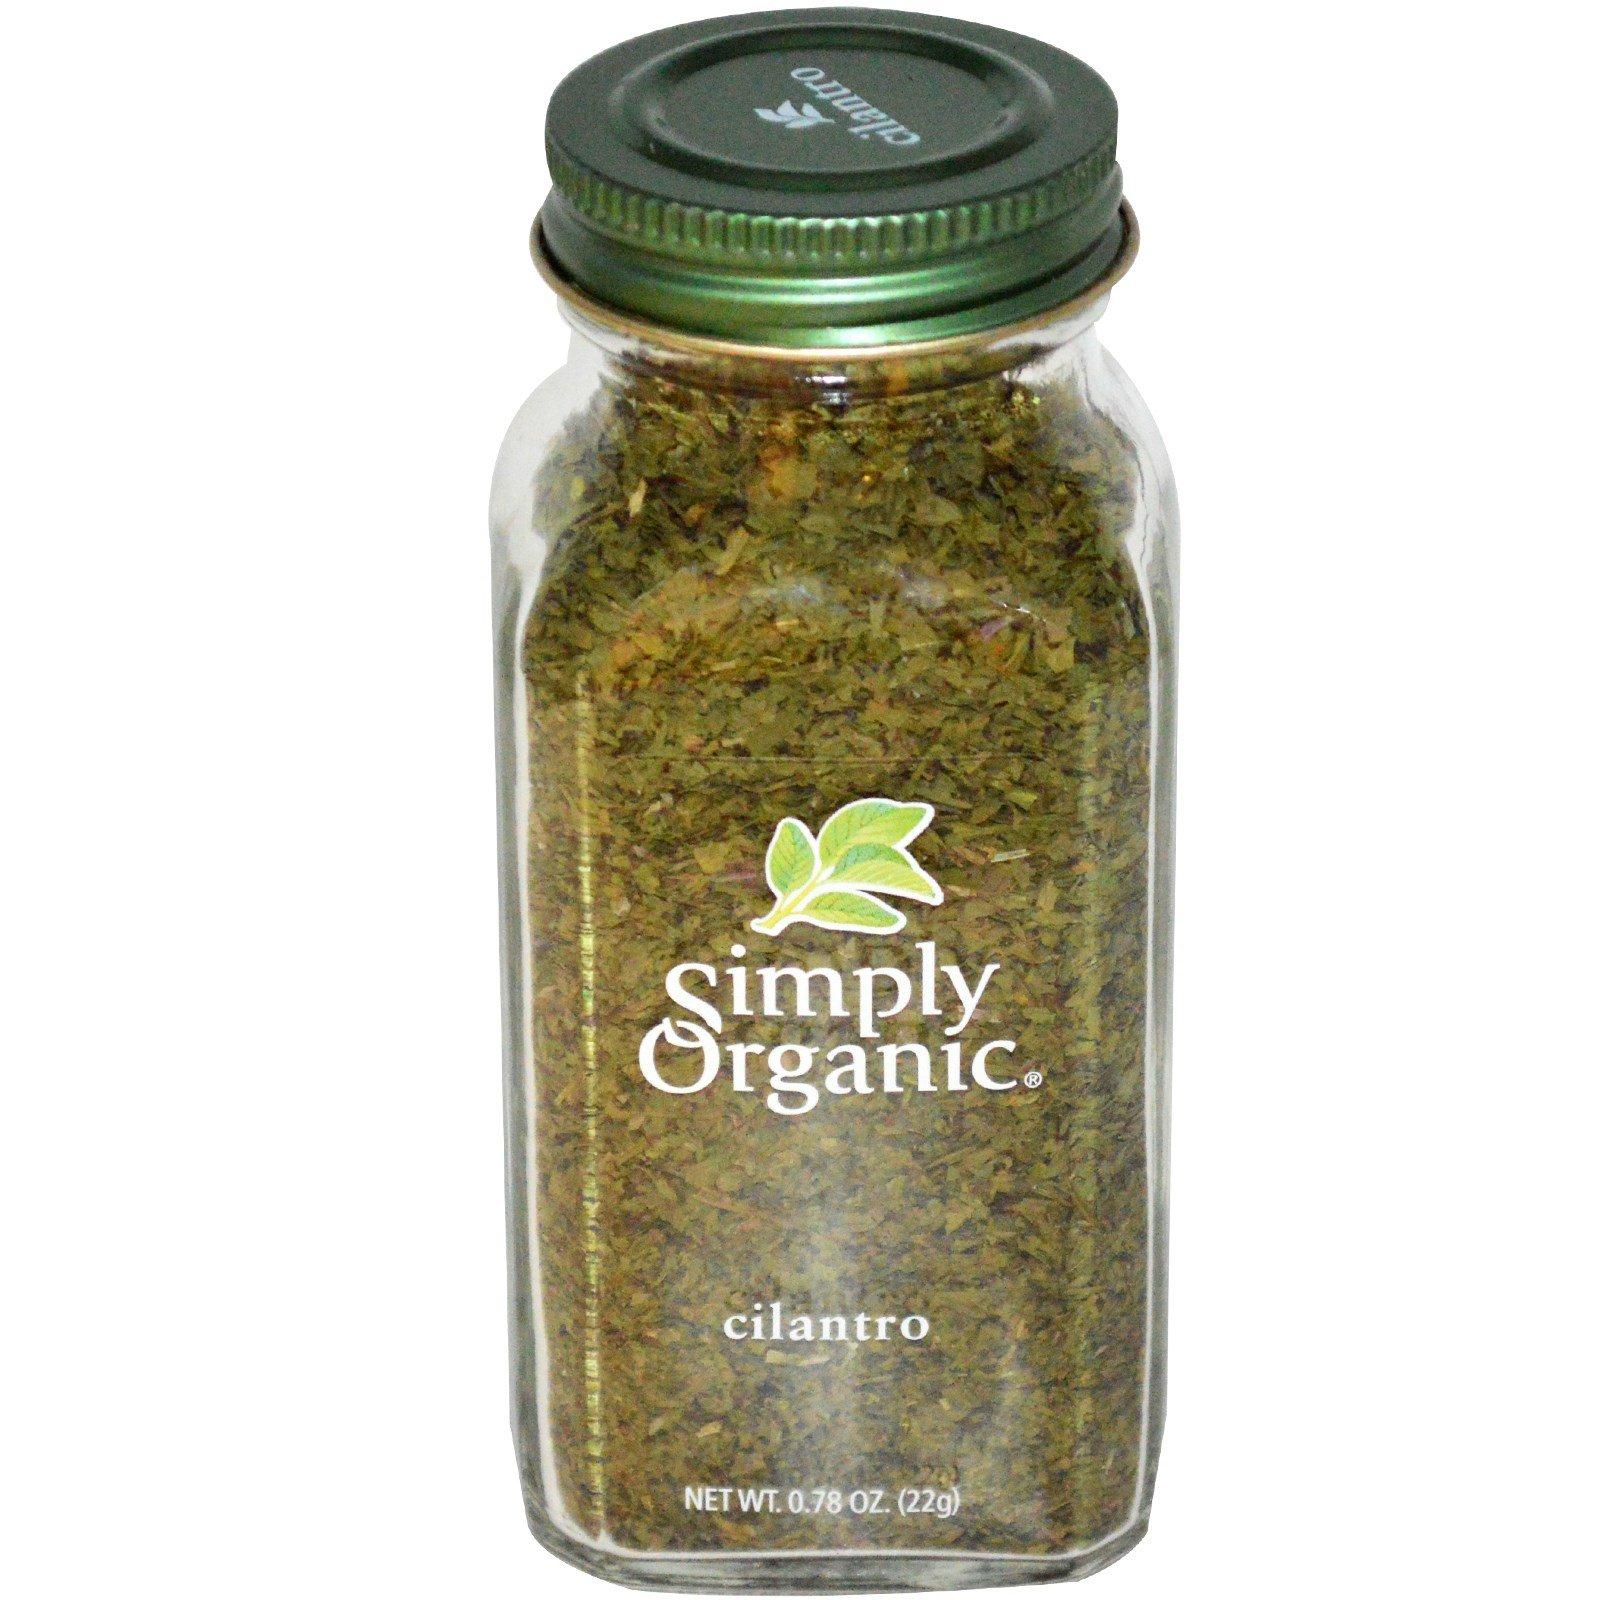 Simply Organic, Cilantro, 0.78 oz(Pack of 3)